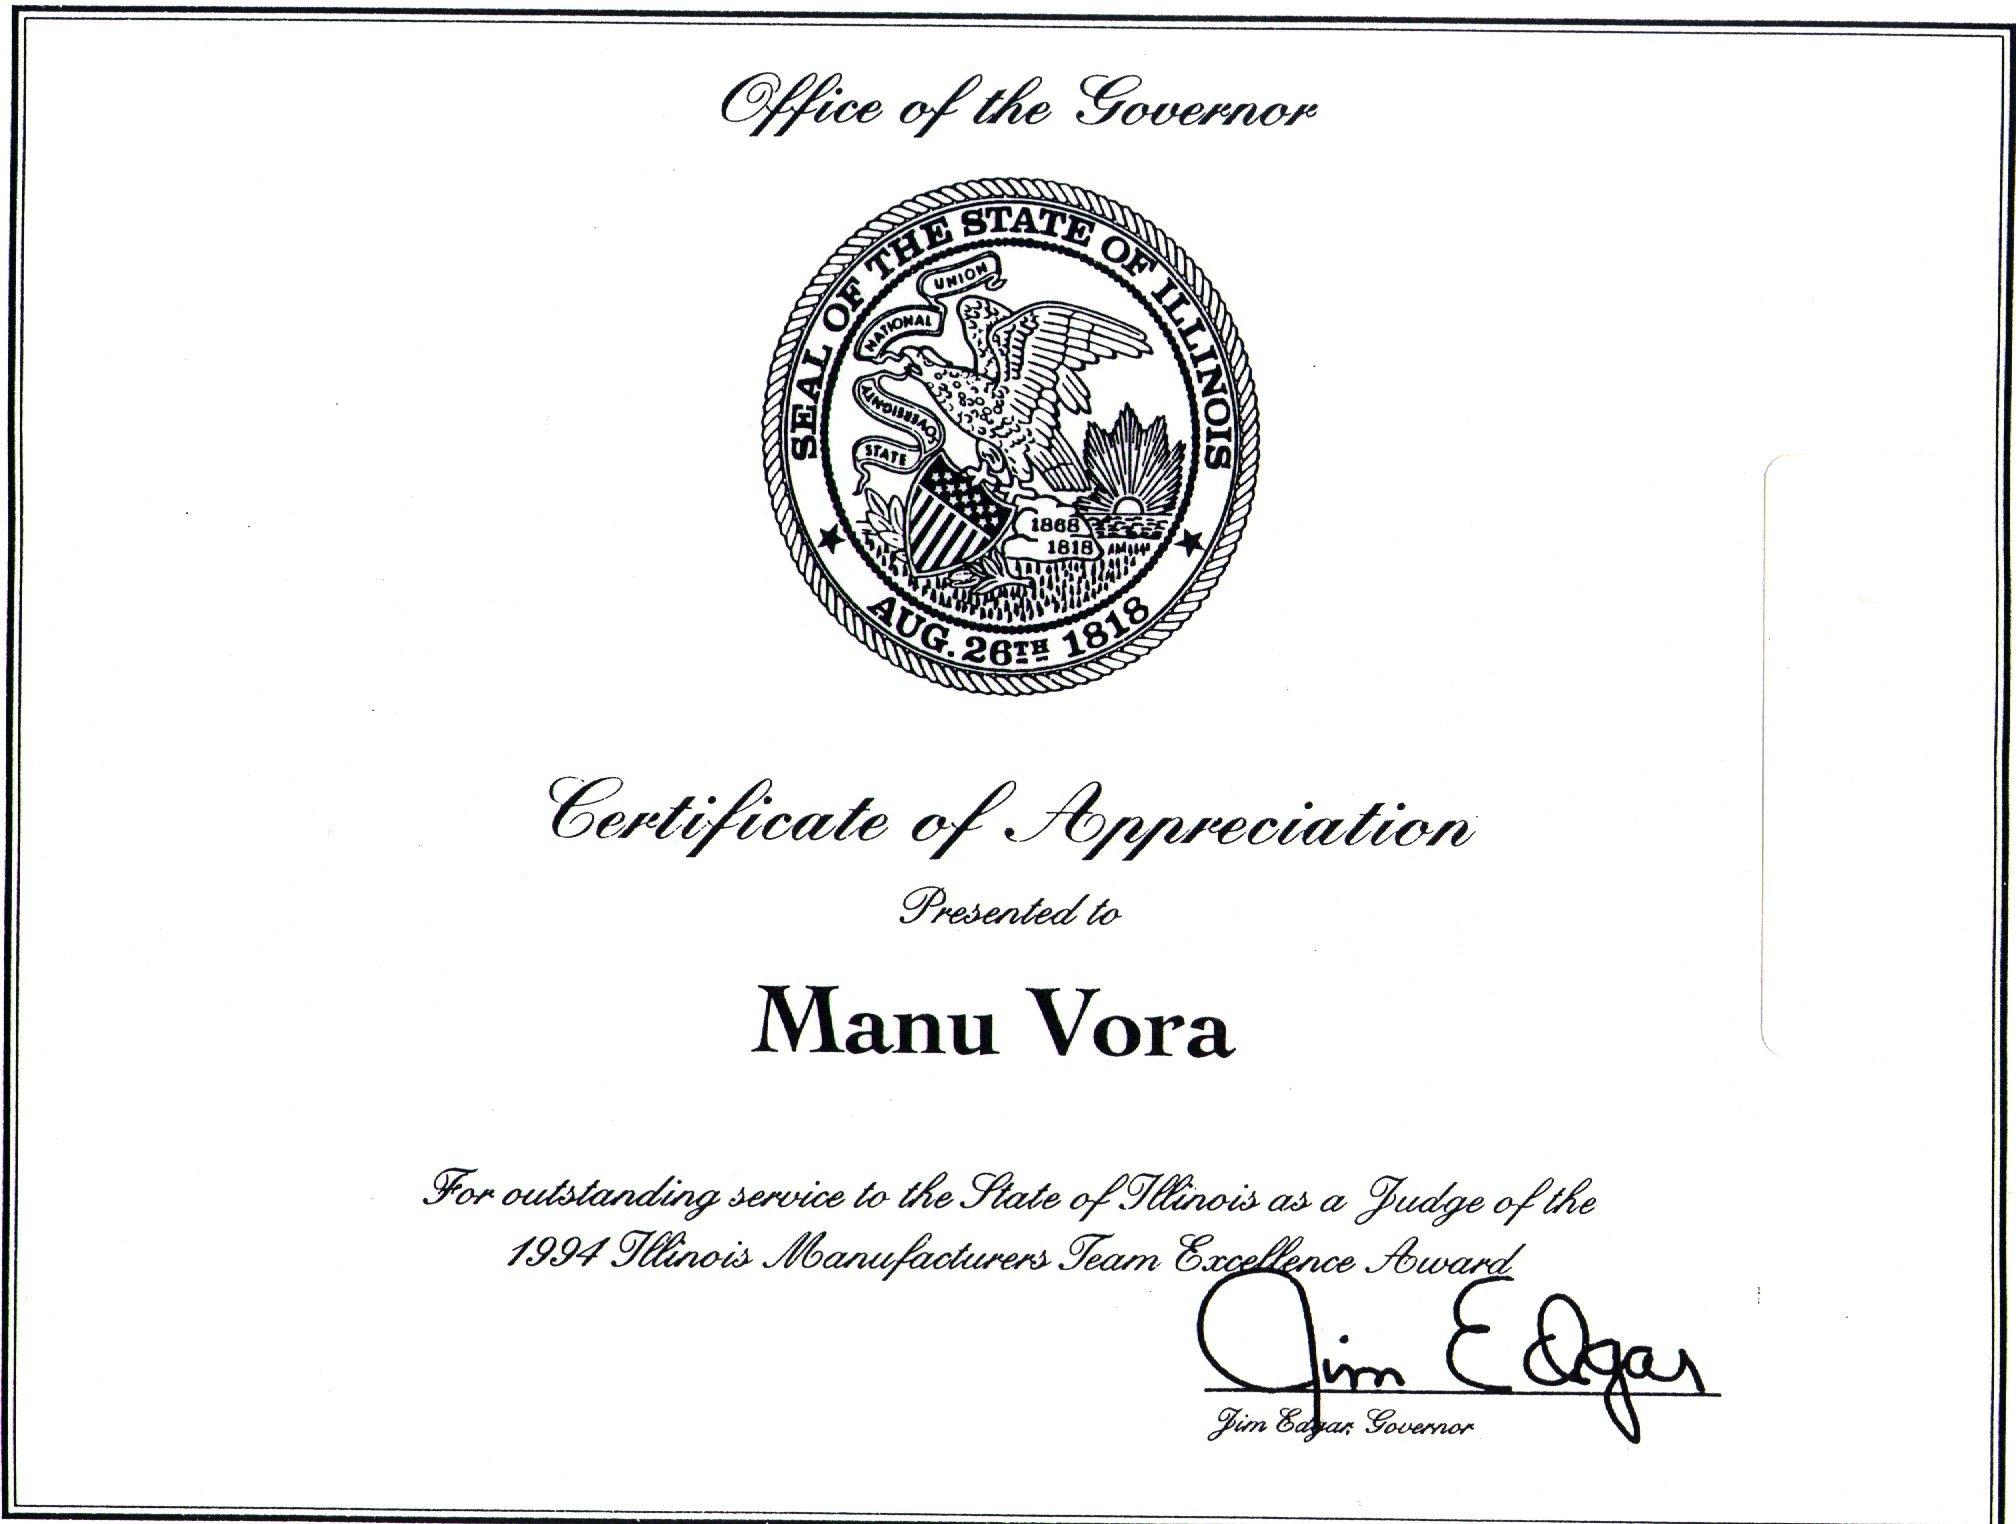 Academic Award Ceremony Invitations